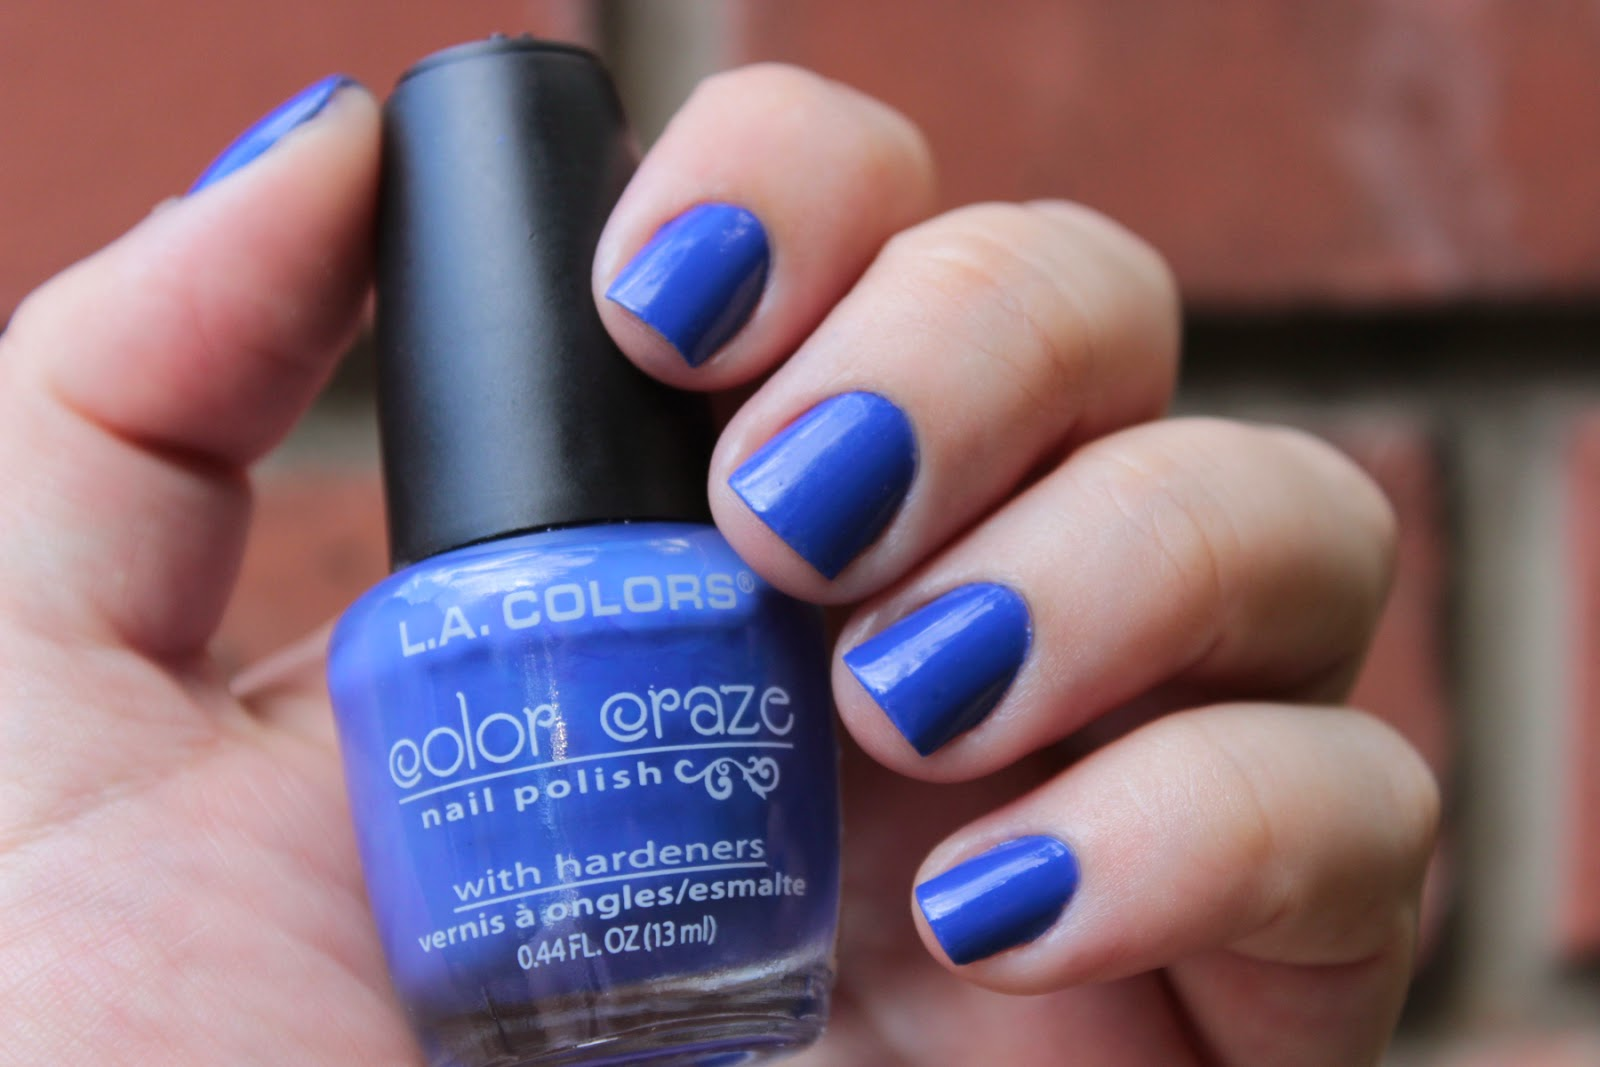 L.A. Colors, esmalte, vernis, nails, unhas, nailpolish, mão feita, fashion mimi